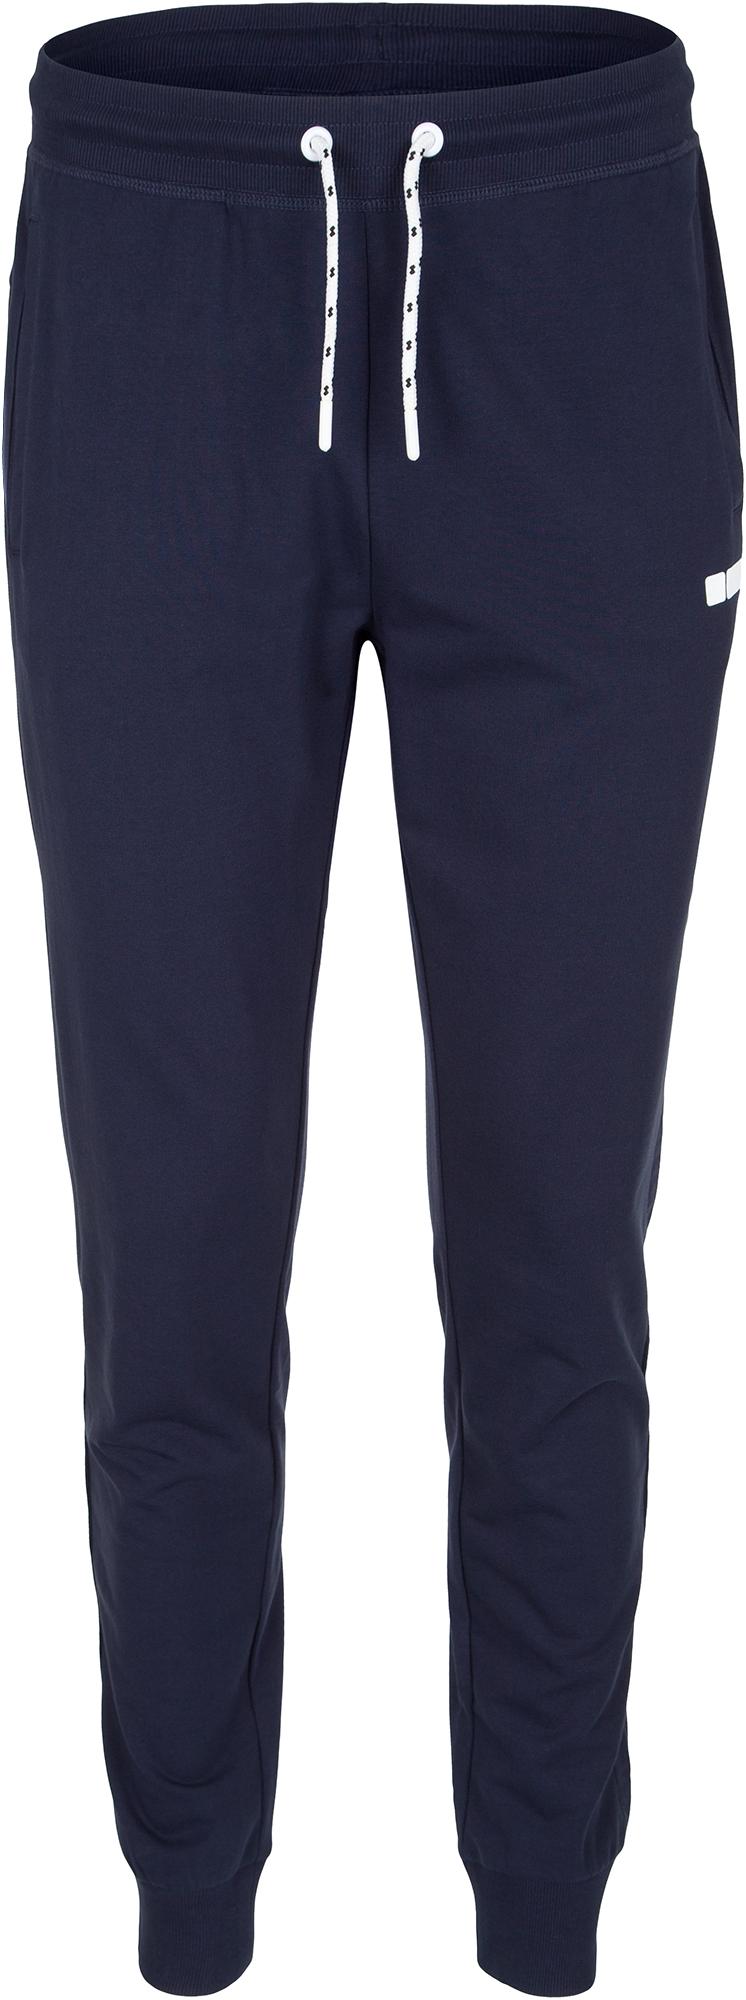 Freddy Брюки мужские Freddy Basic Cotton, размер 50-52 недорго, оригинальная цена